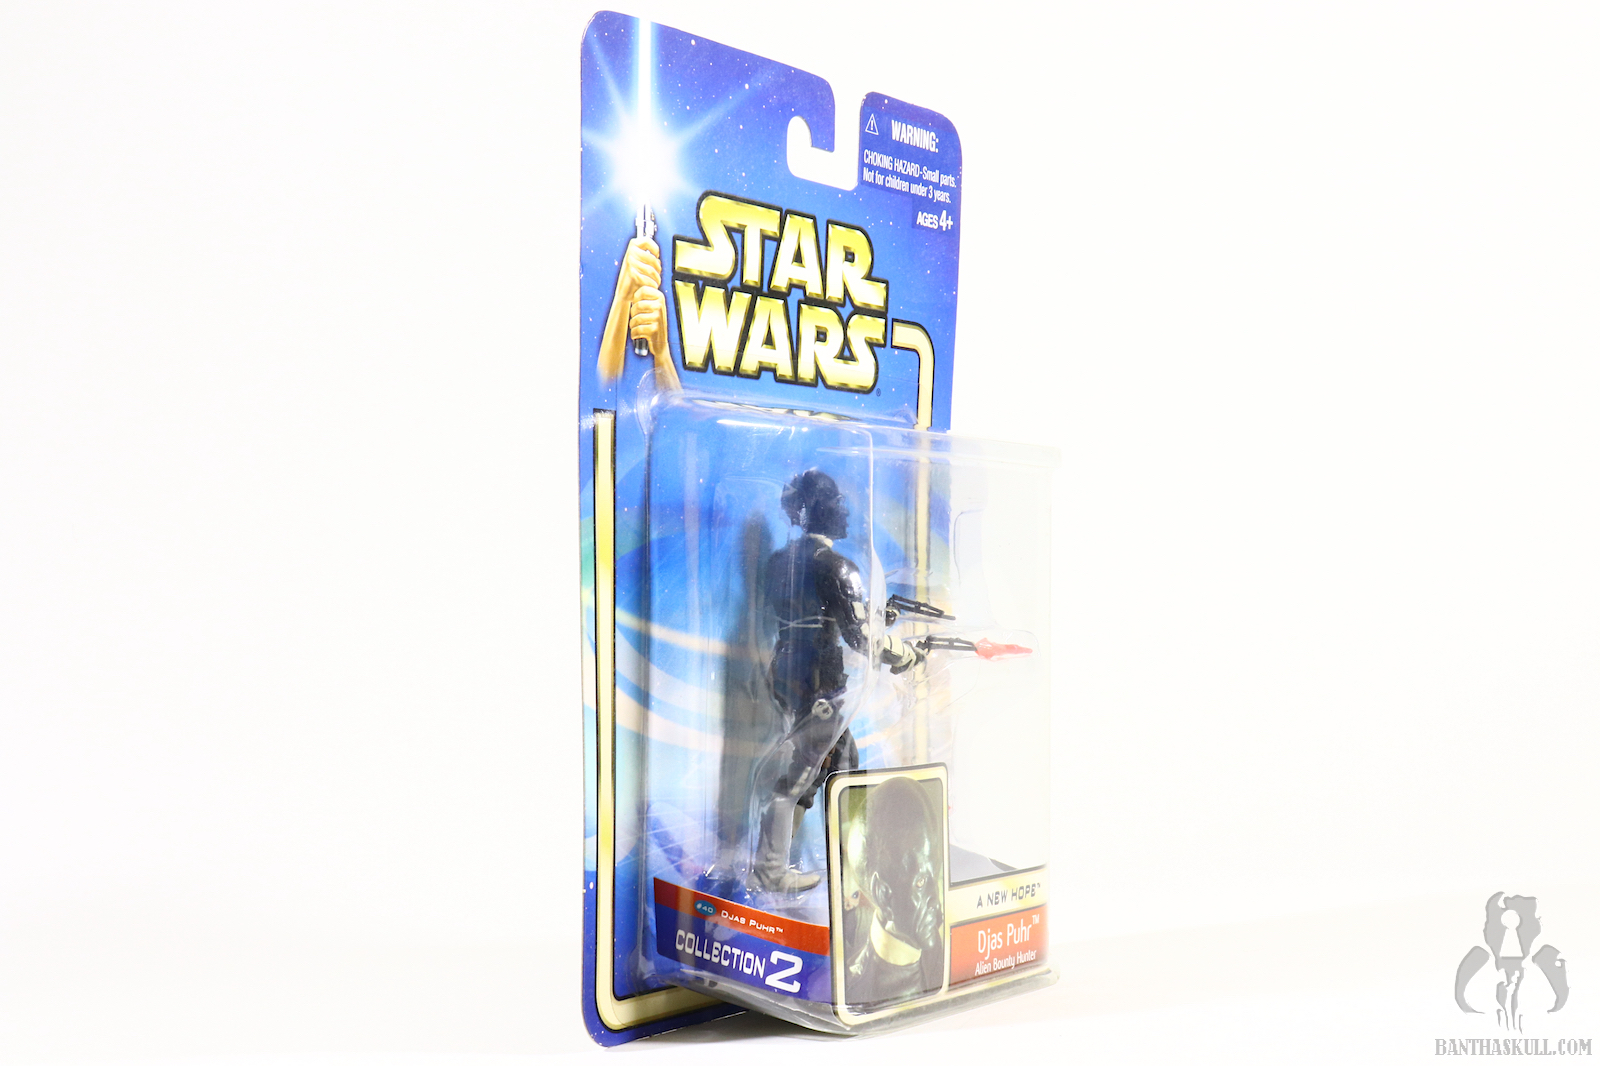 Star Wars SAGA Collection 02-40 Cantina Patron Djas Puhr Loose Complete